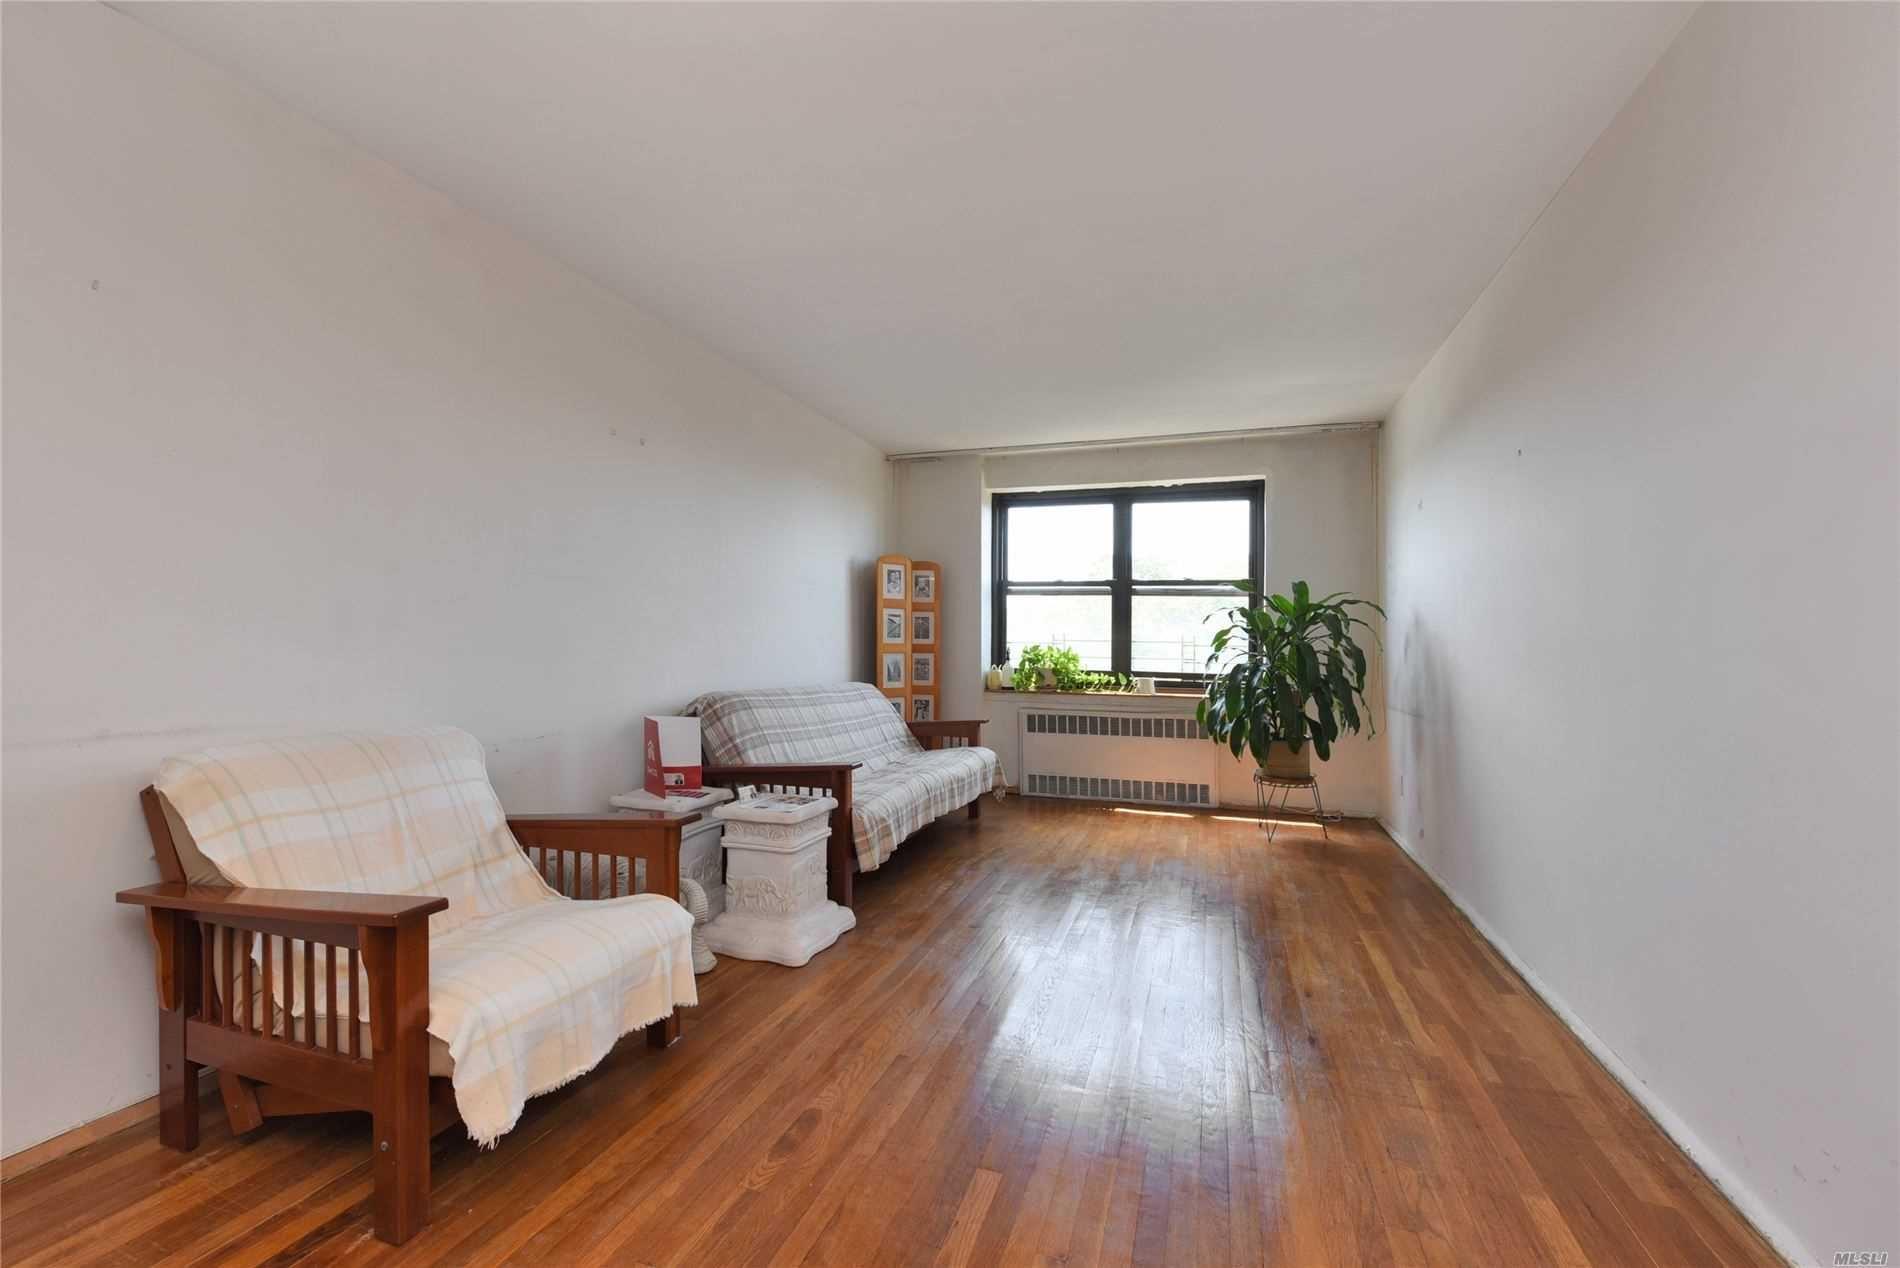 141-10 28th Avenue #6D, Flushing, NY 11354 - MLS#: 3200715